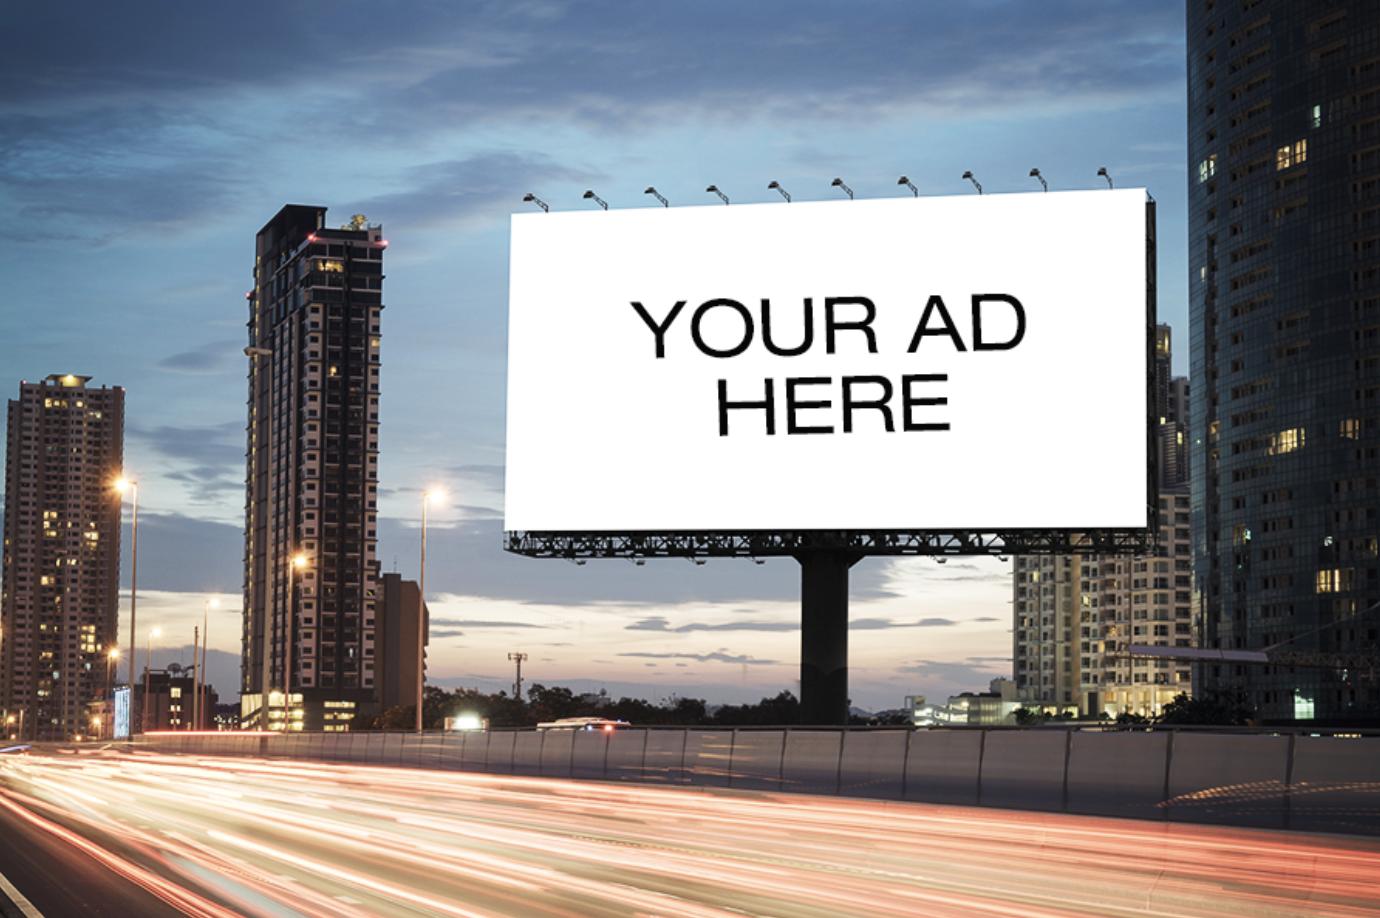 great billboard location